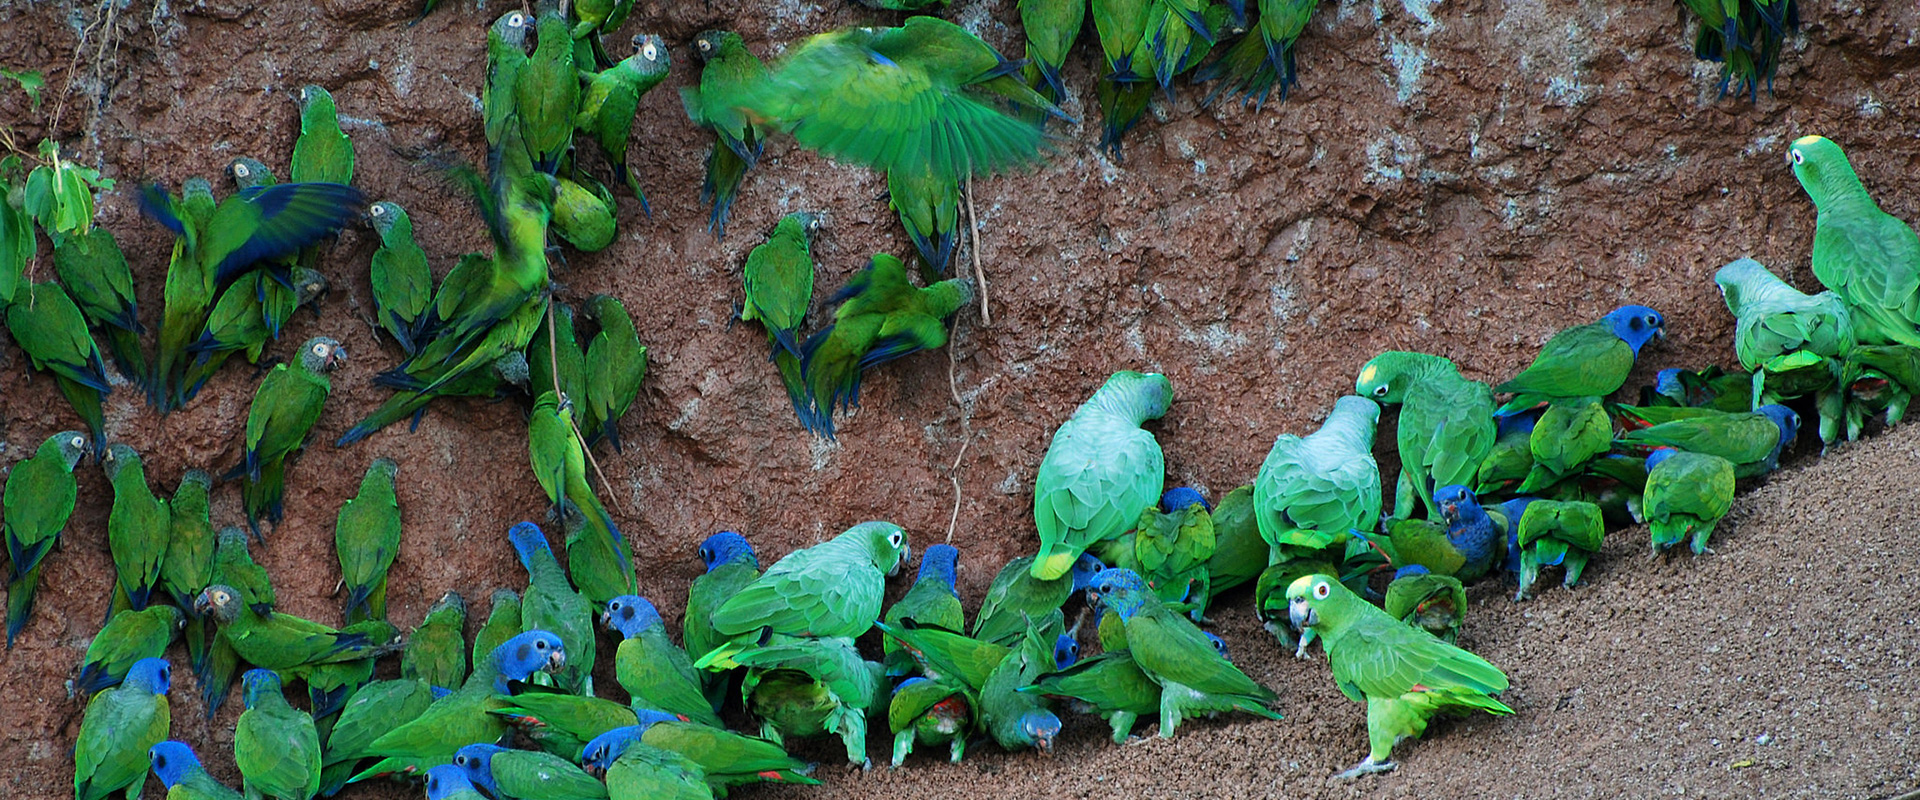 Parrot Licks Yasuni Ecuador